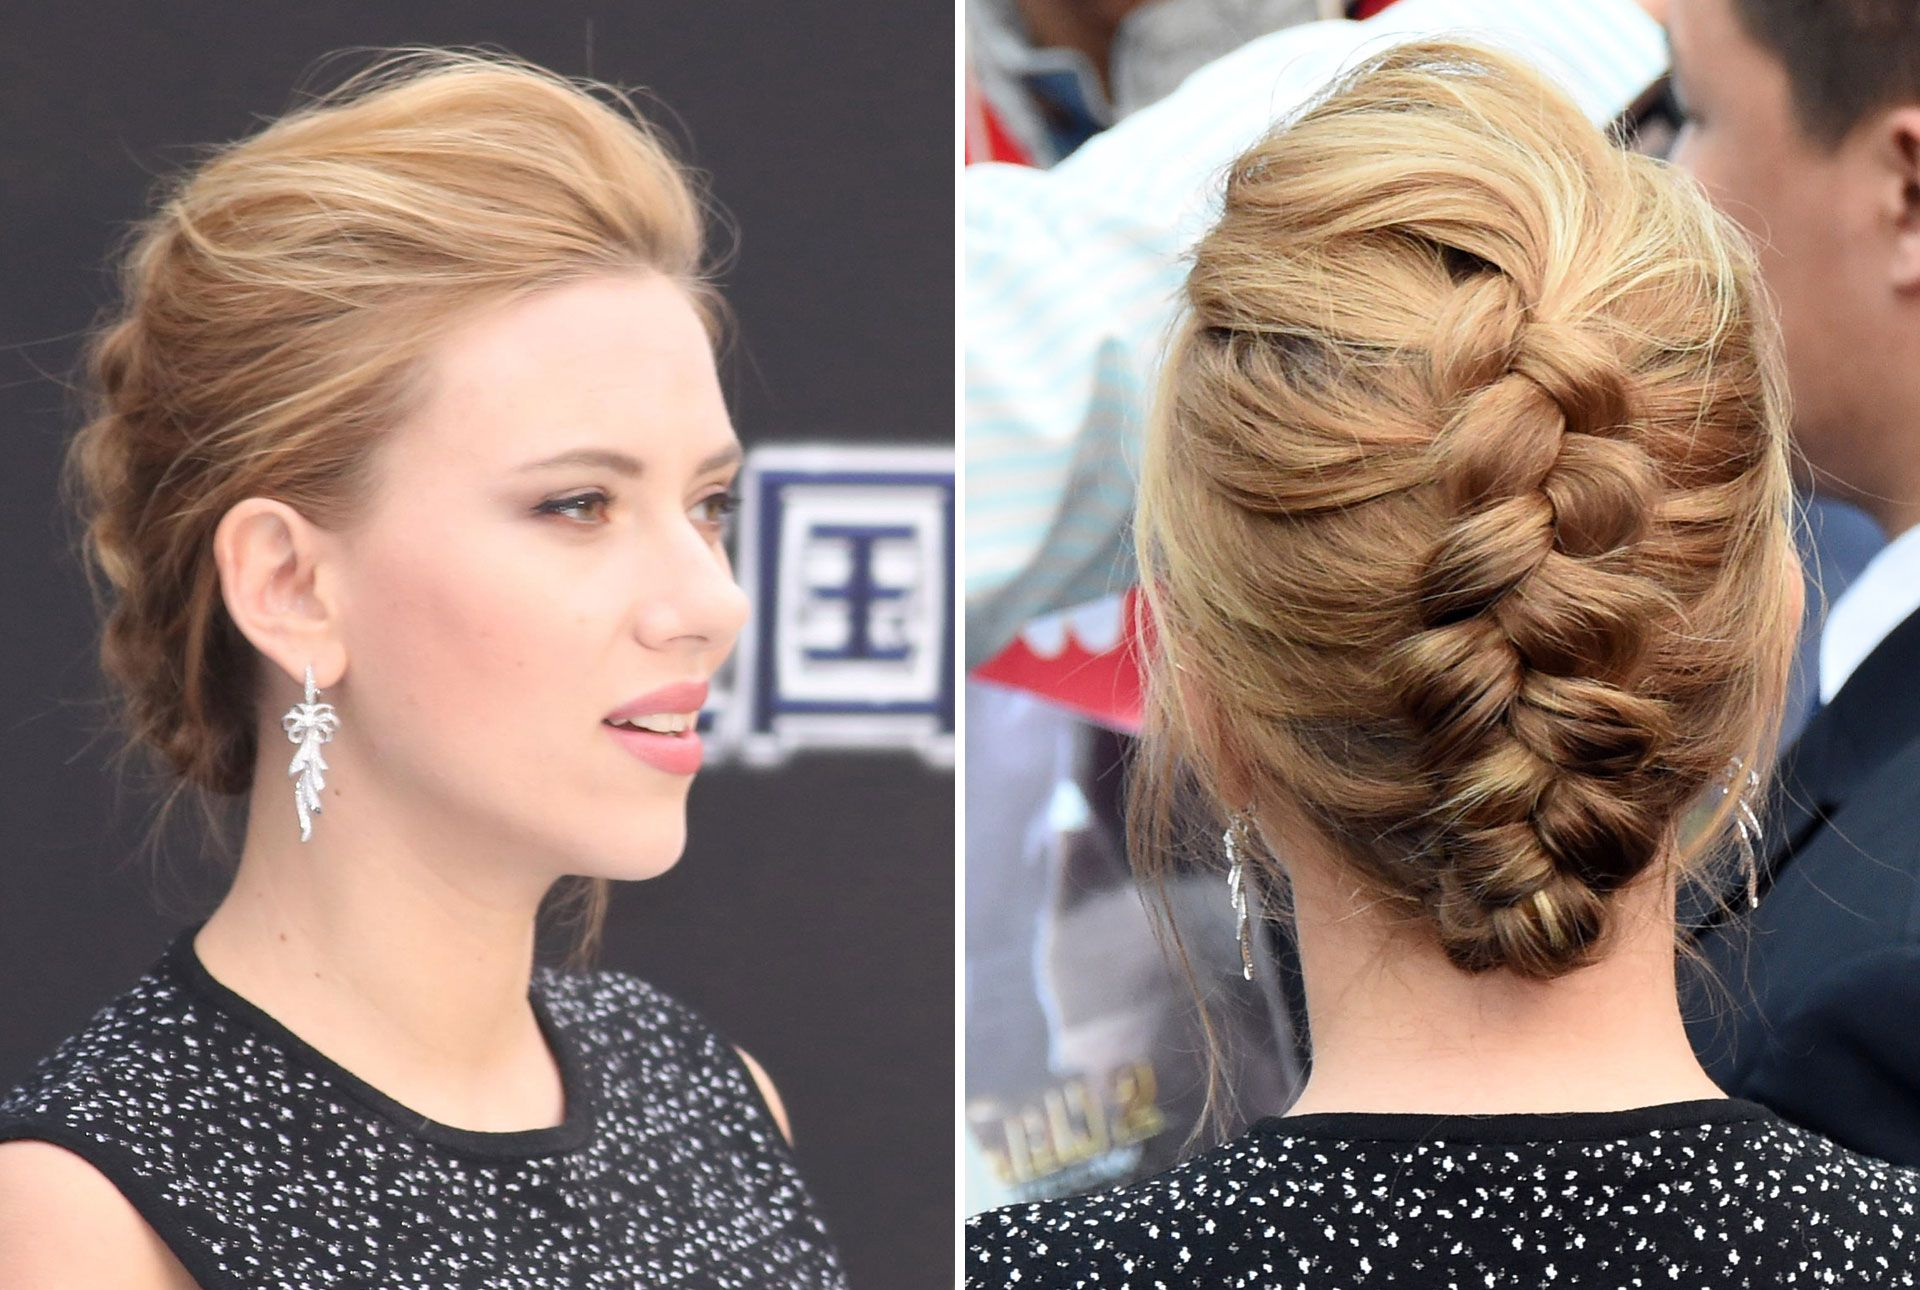 Aligned-Mid-Braid-Hairstyle